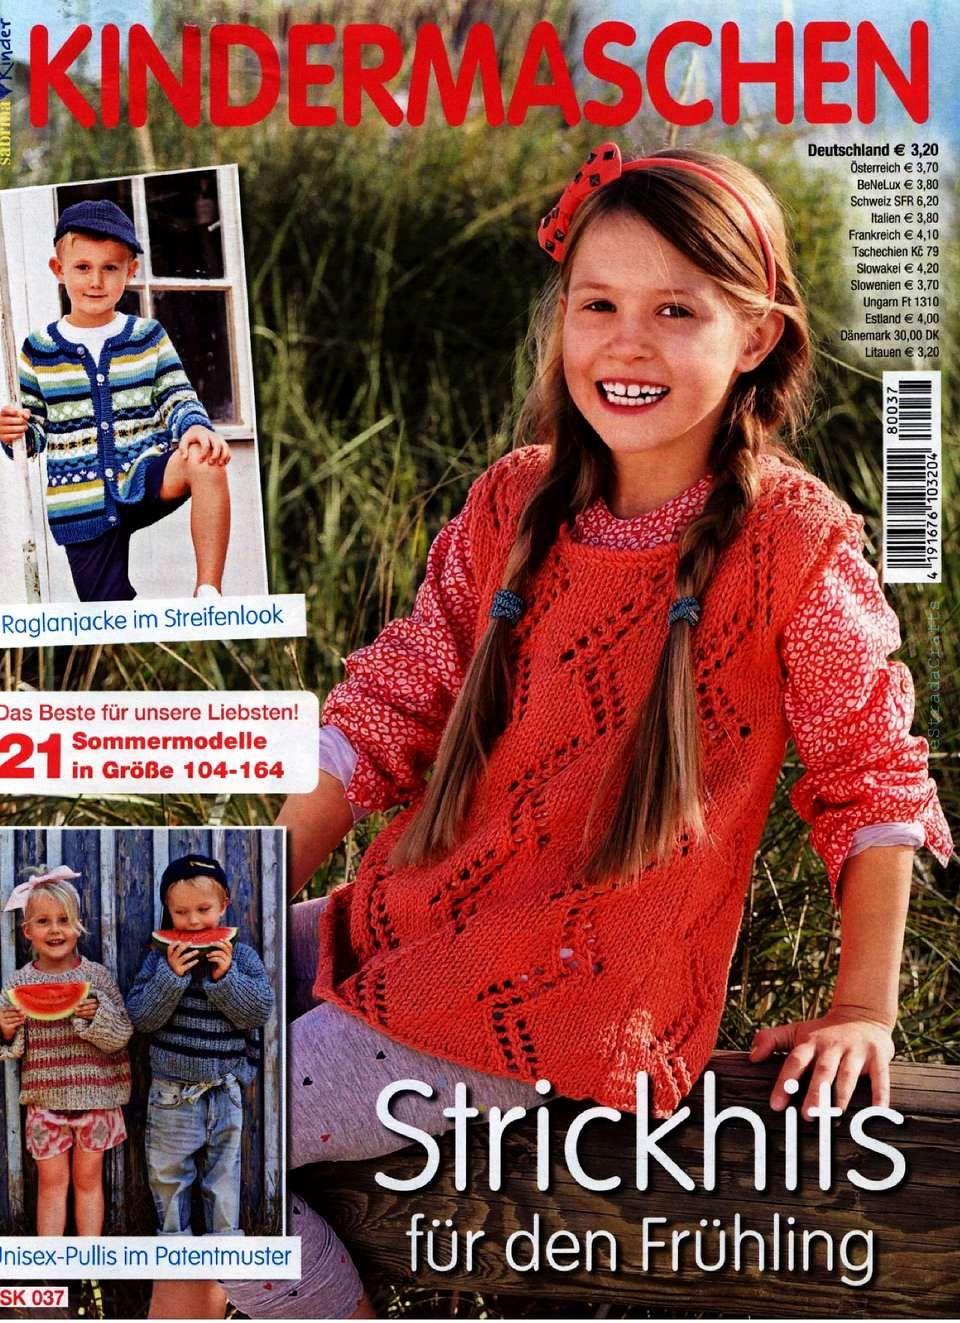 Sabrina Kinder Sk 037 Kindermaschen 2018 Handmade Magazines